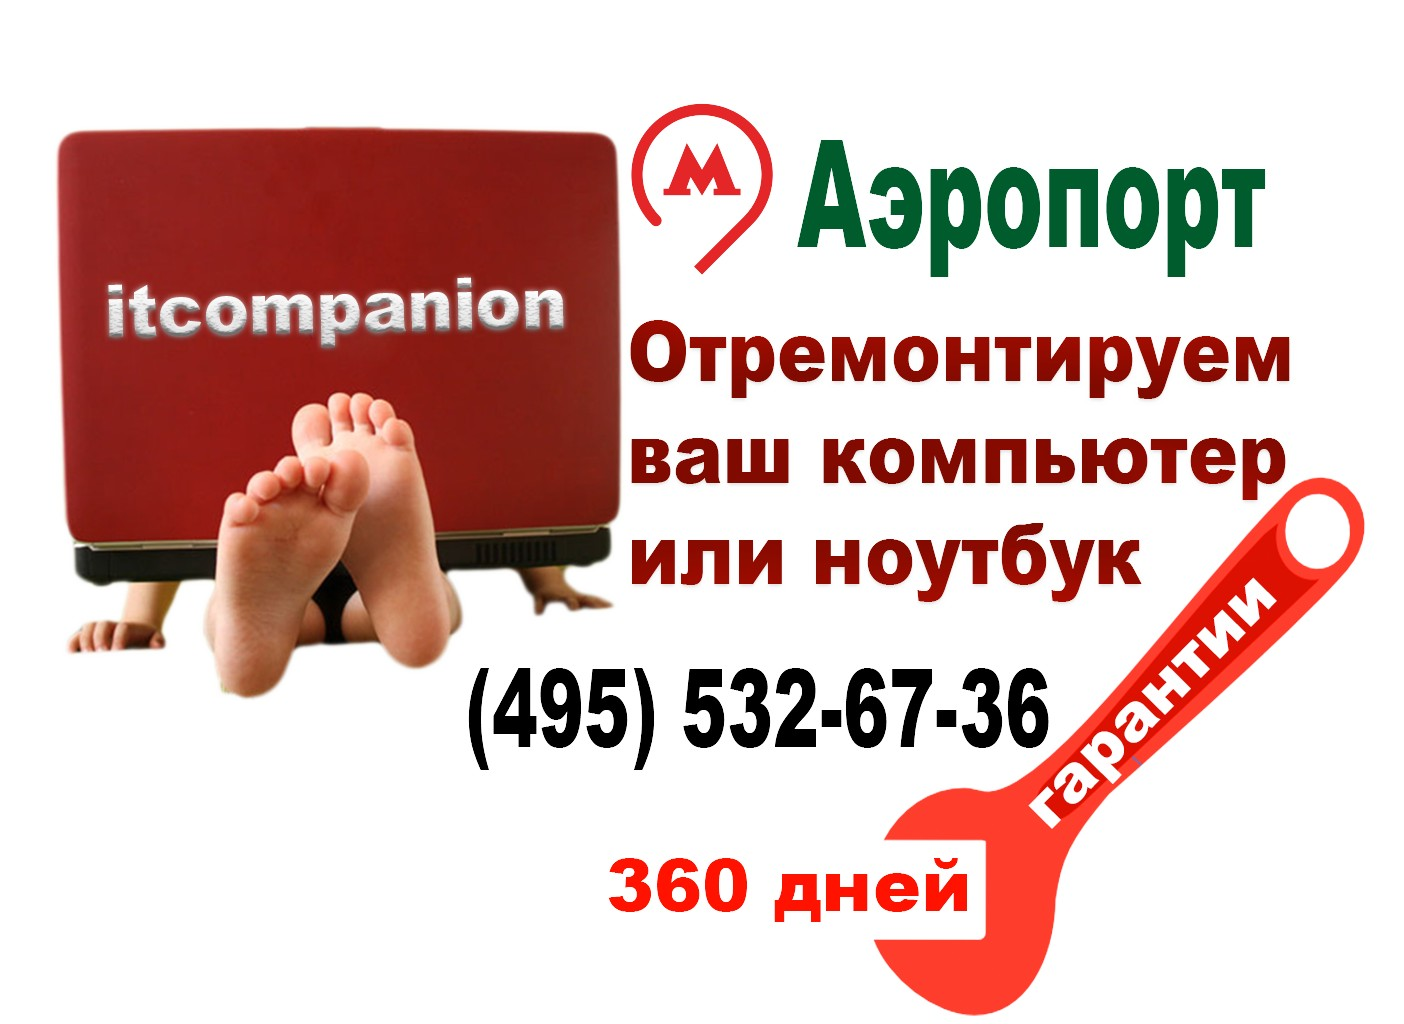 компьютерная помощь 89296400789_itcompanion.ru_аэропорт